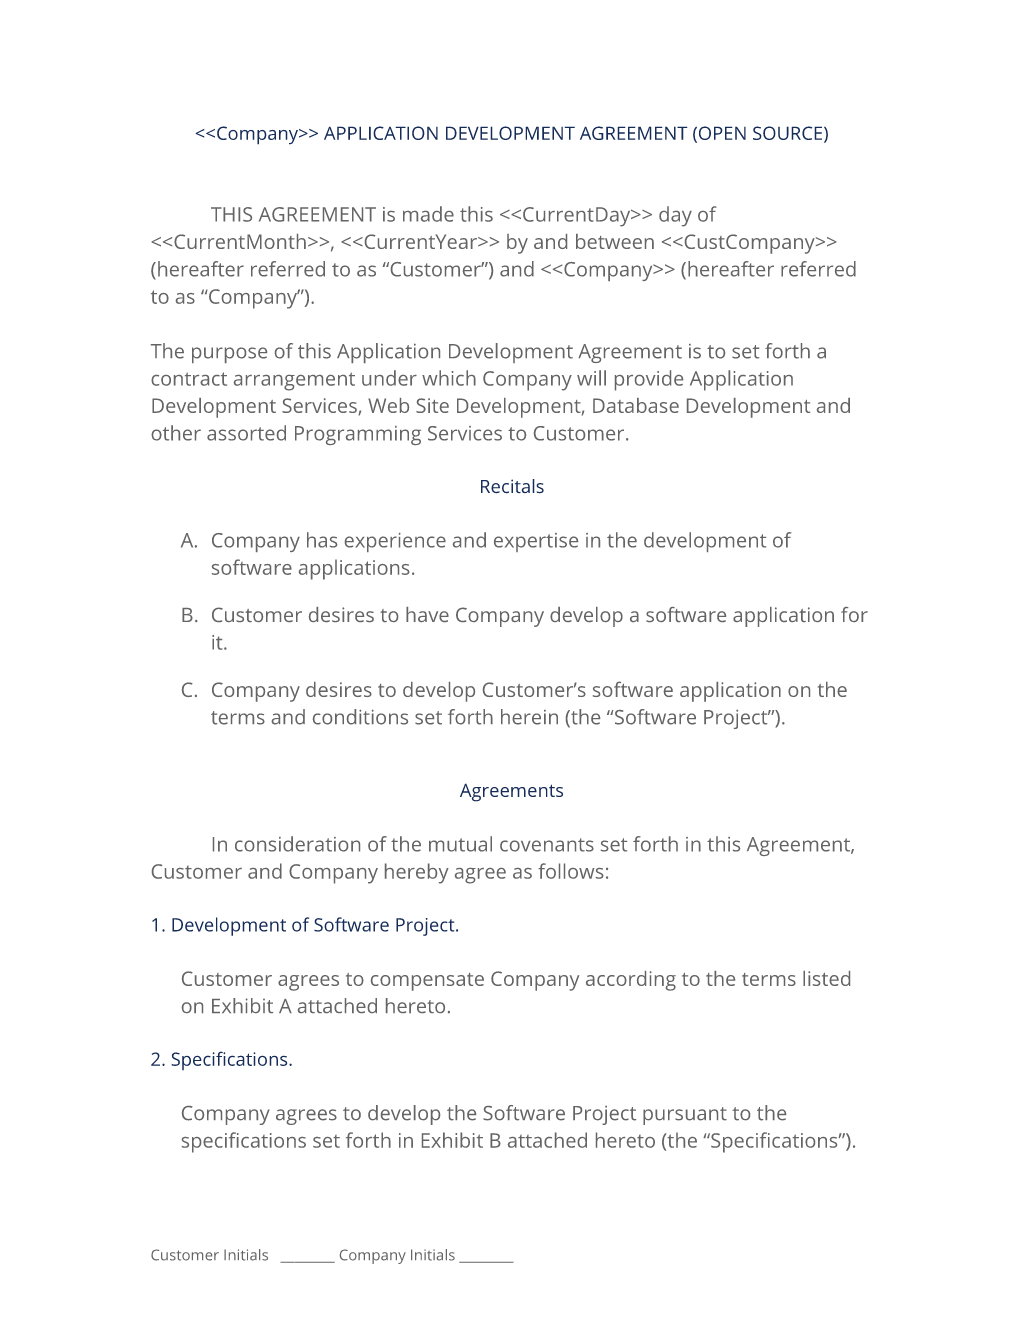 Open Source Application Development Agreement | Contract ...